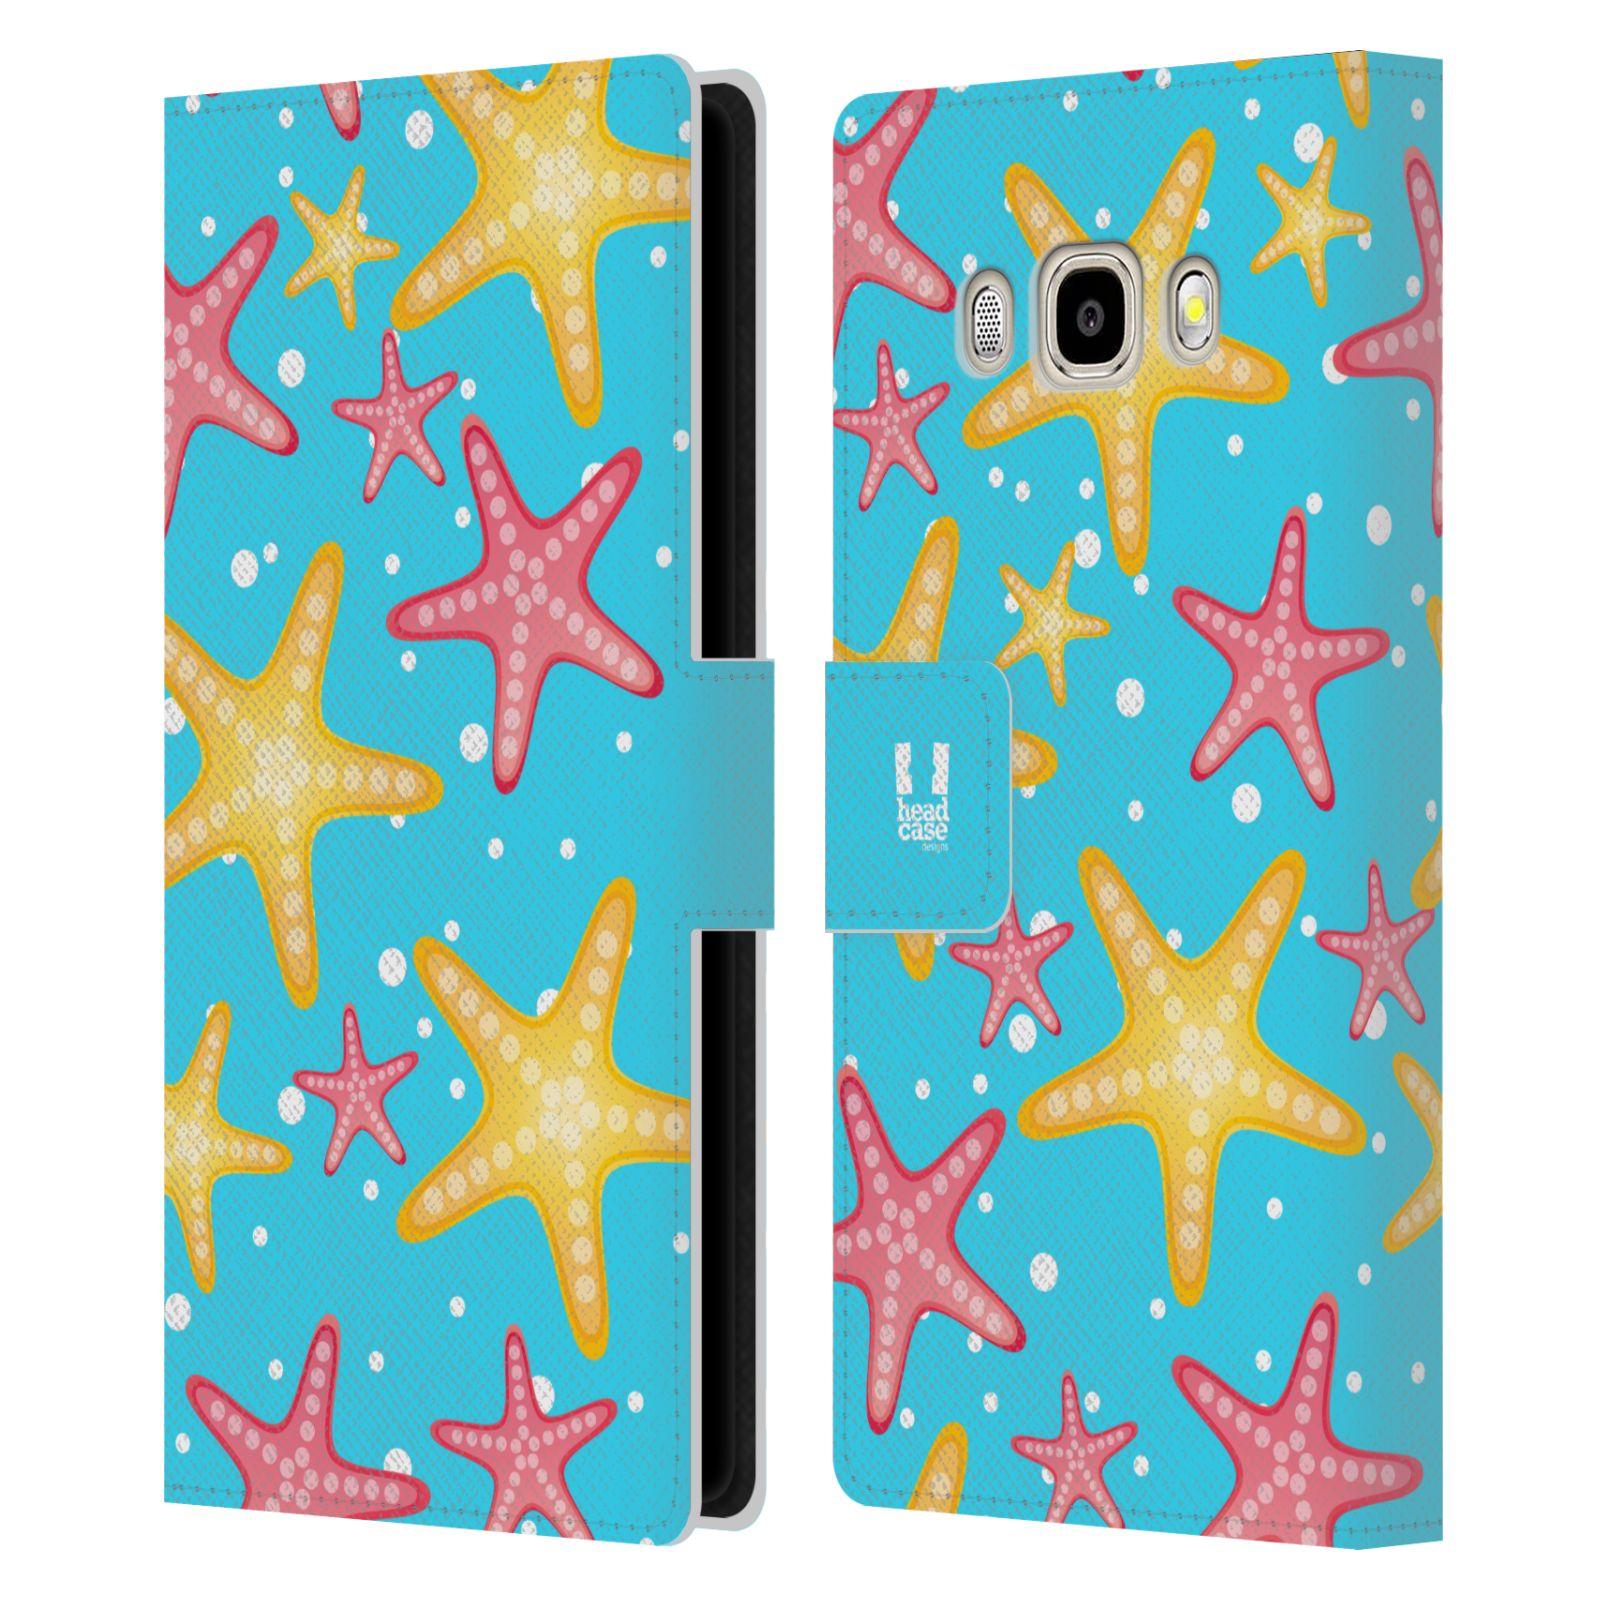 HEAD CASE Flipové pouzdro pro mobil Samsung Galaxy J5 2016 Mořský živočich hvězdice modrá barva pozadí